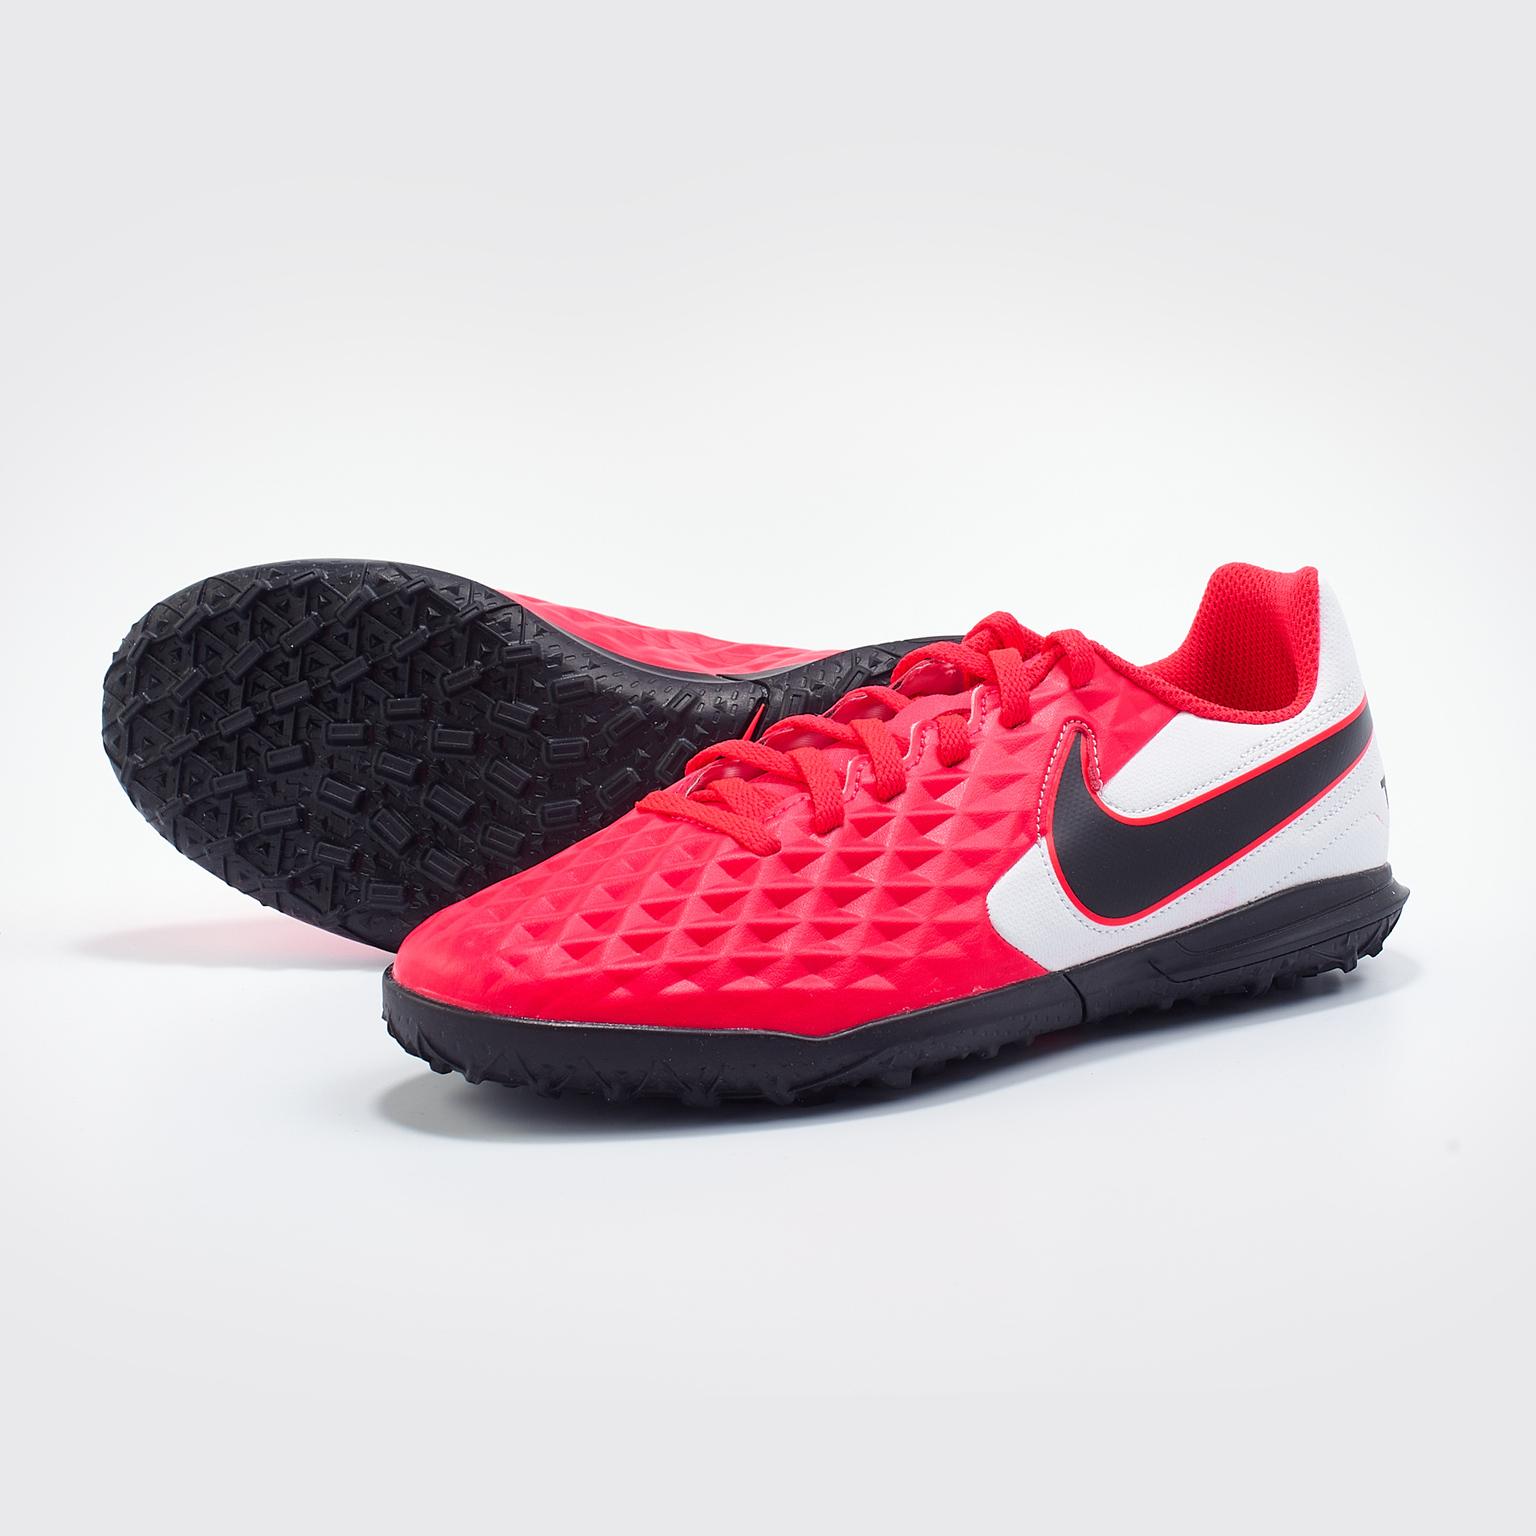 Шиповки детские Nike Legend 8 Club TF AT5883-606 шиповки детские nike legend 8 academy tf at5736 606